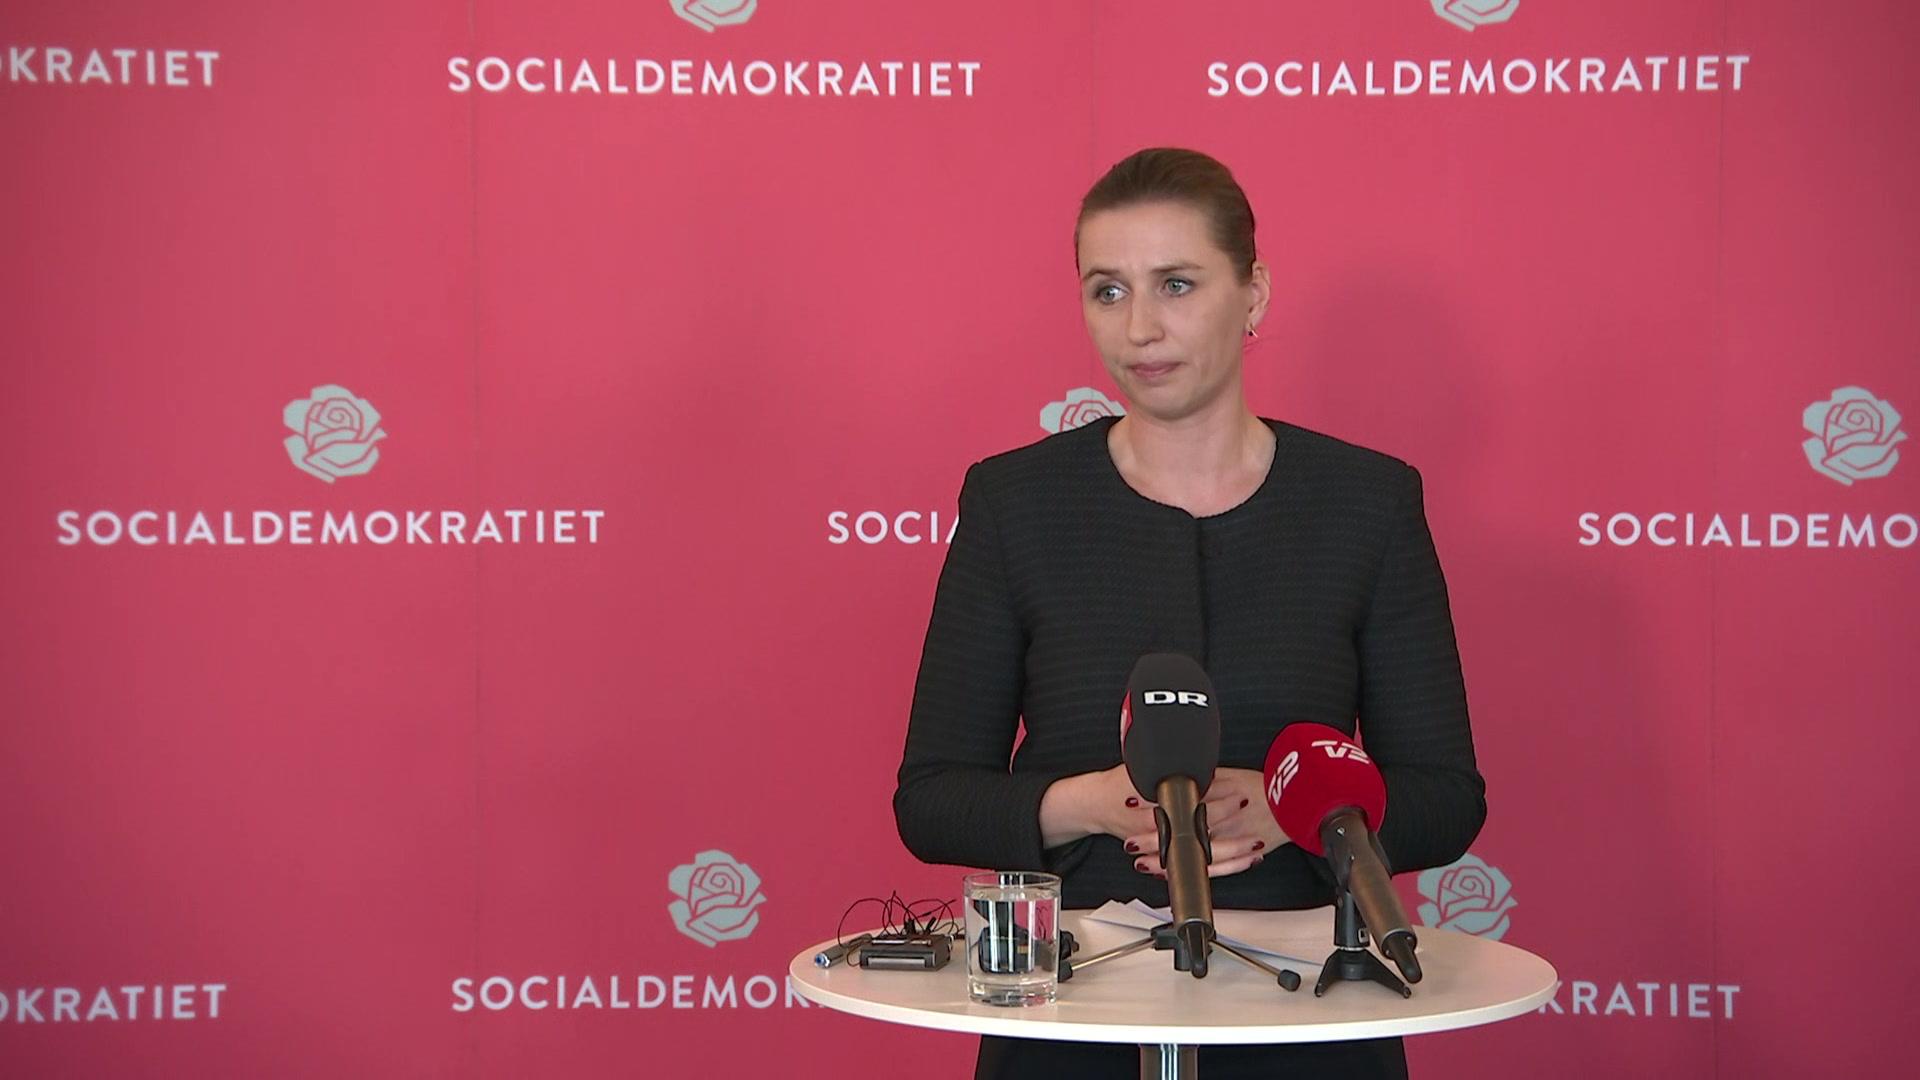 9851366_nisn_xborg_socialdemokraterne-13.12.31.13.jpg